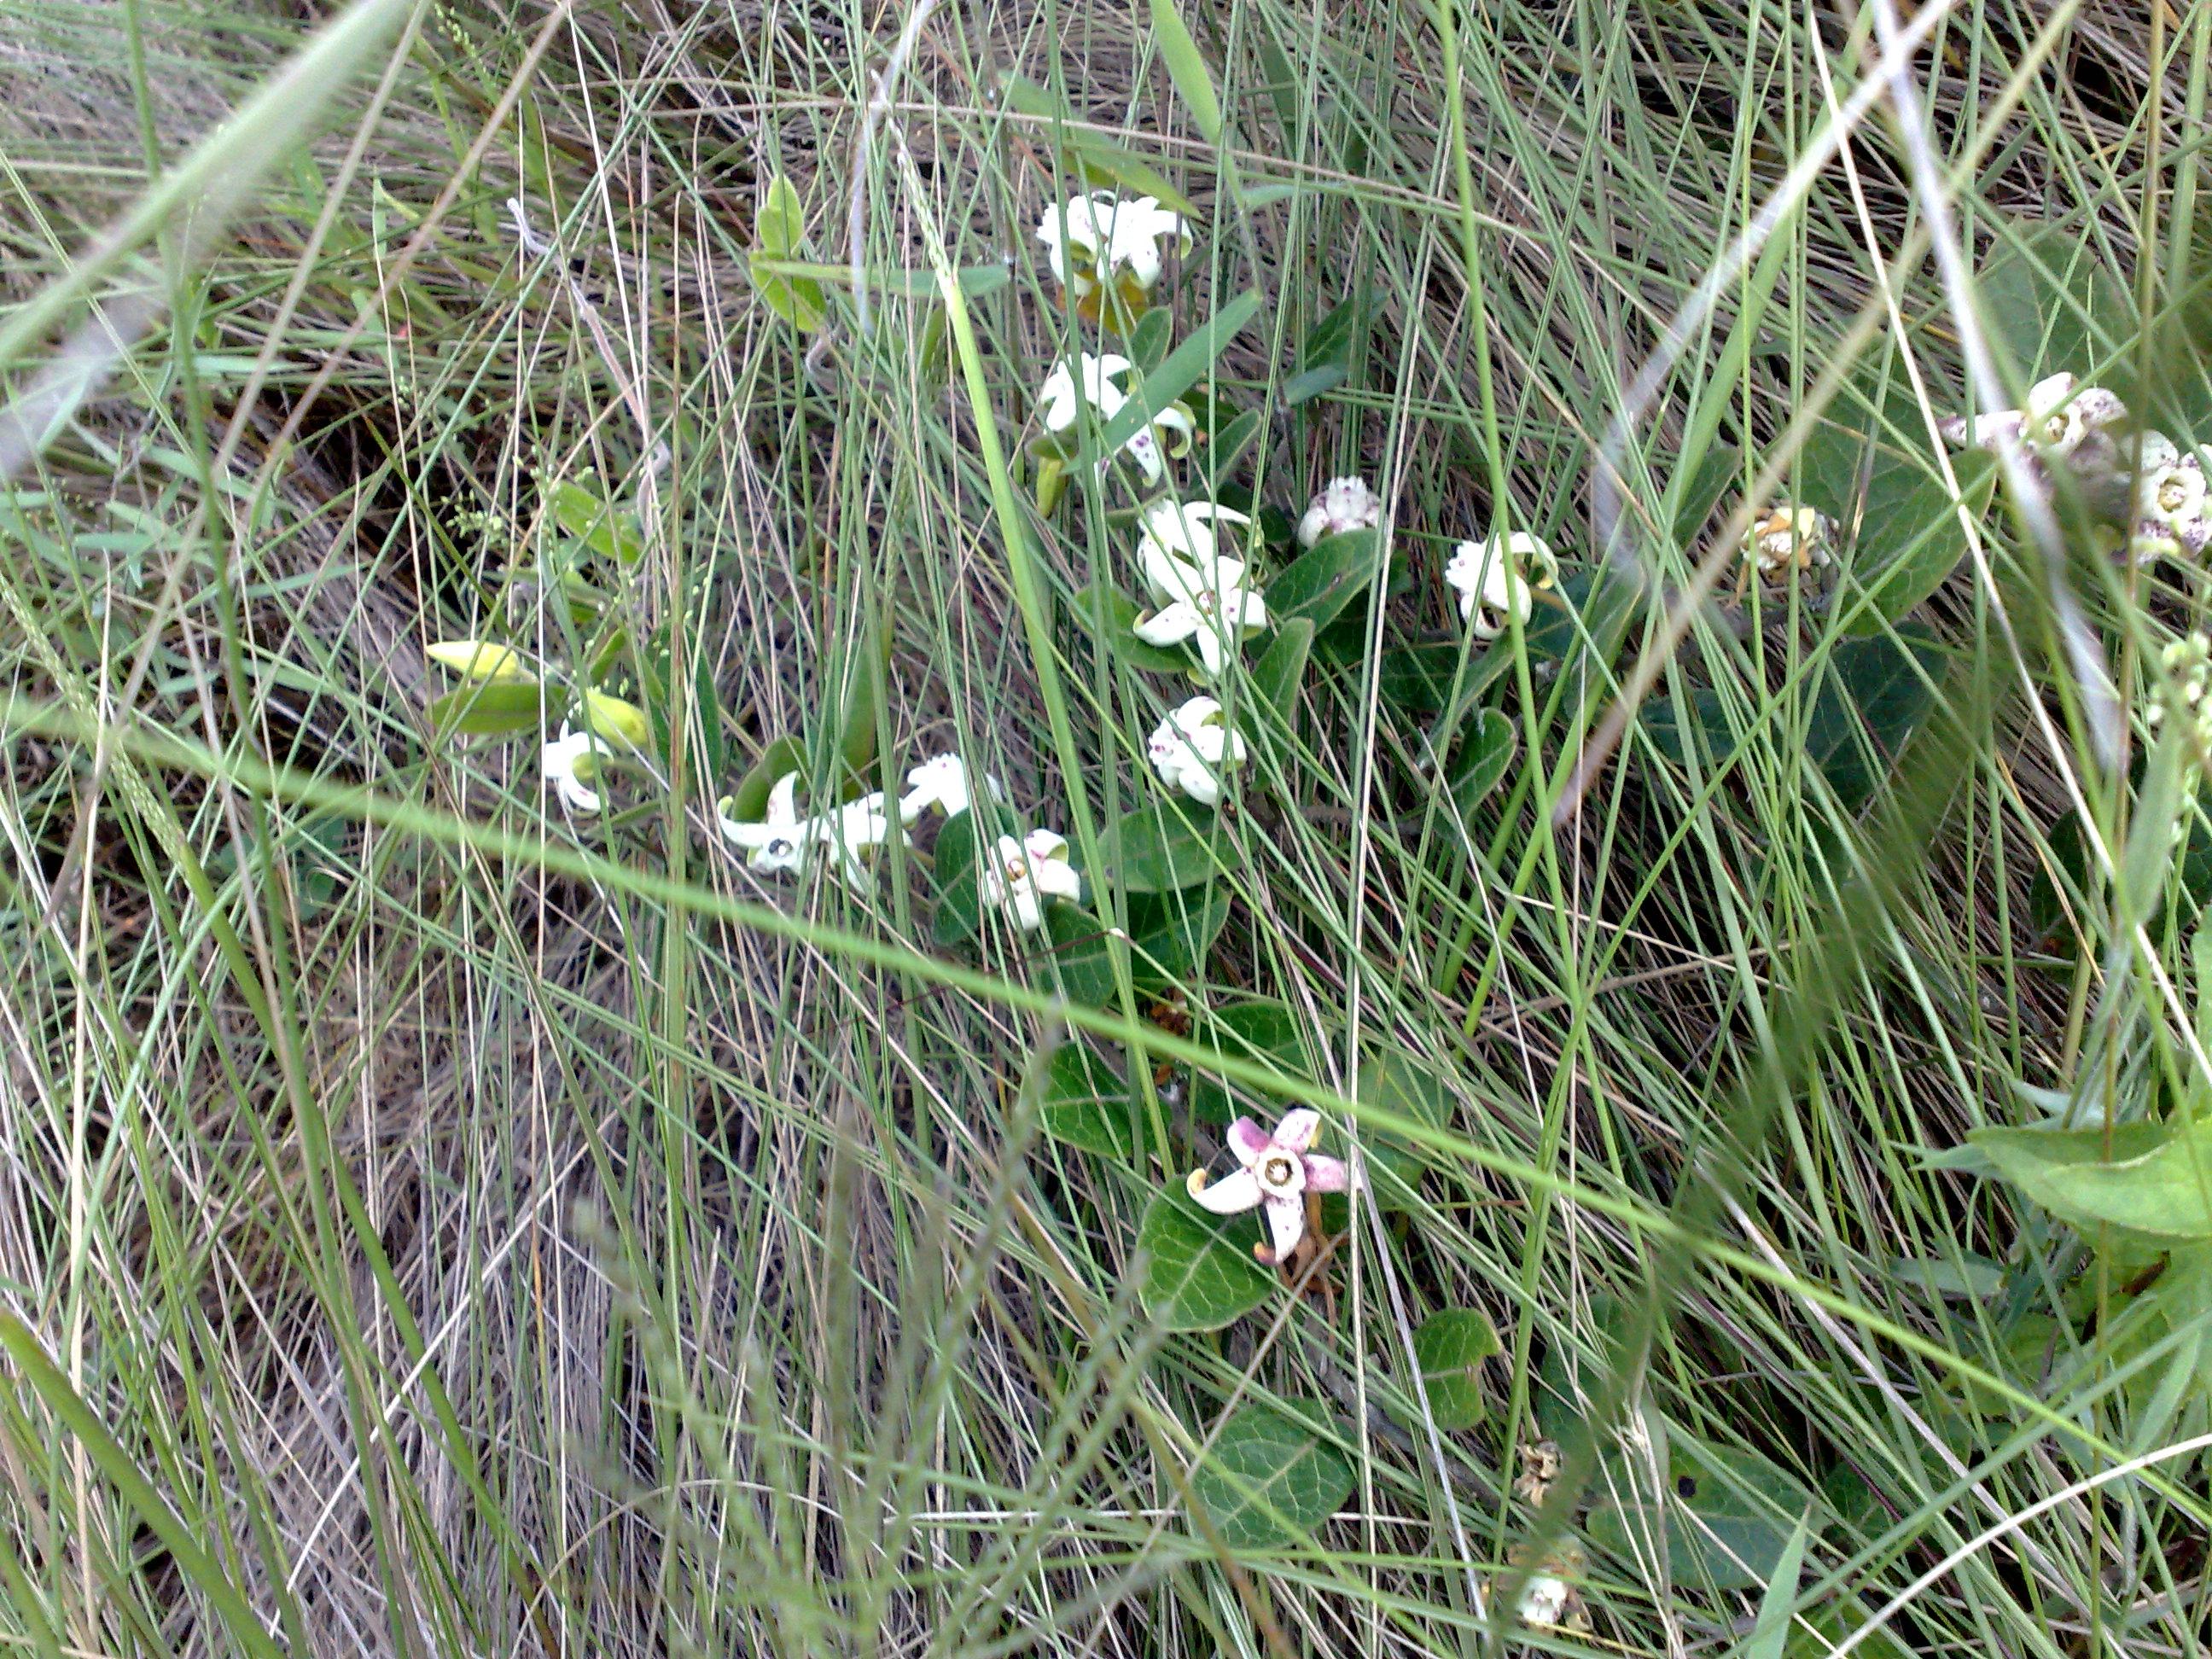 Floral Cometa Florais Filhas de Gaia